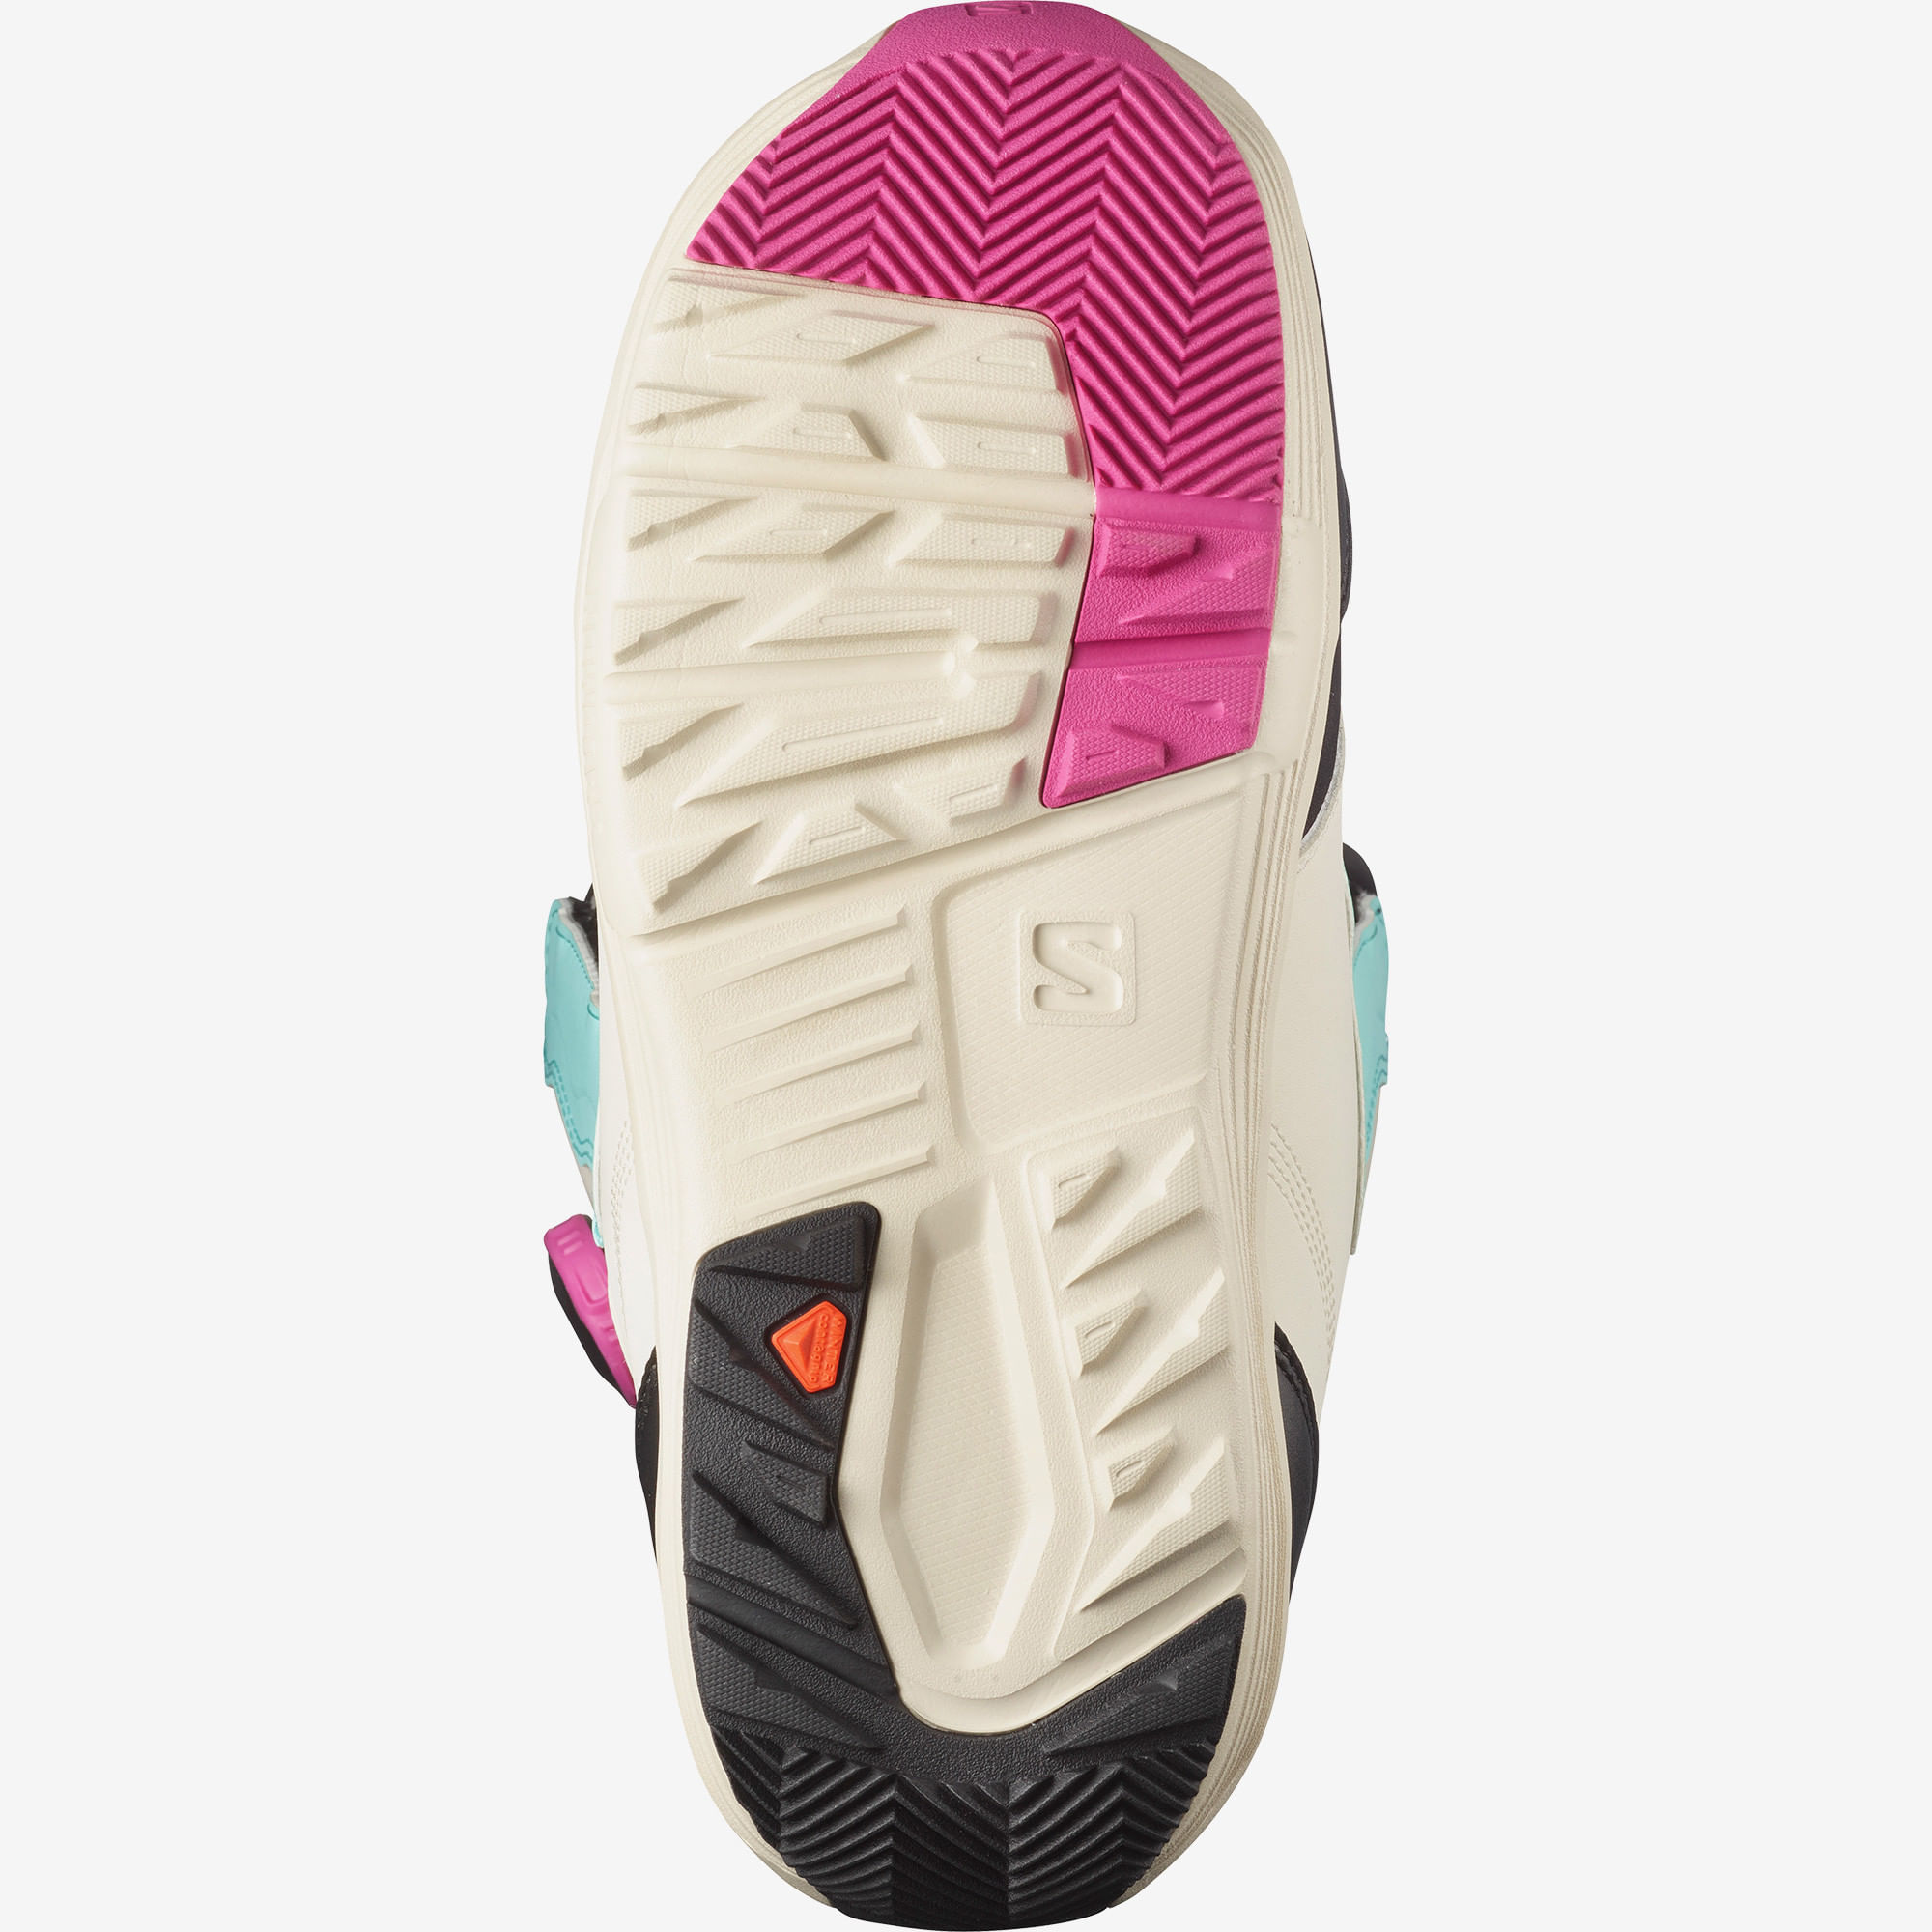 Details about  /Salomon Ivy BOA SJ Women/'s Snowboard Boots NEW 2021